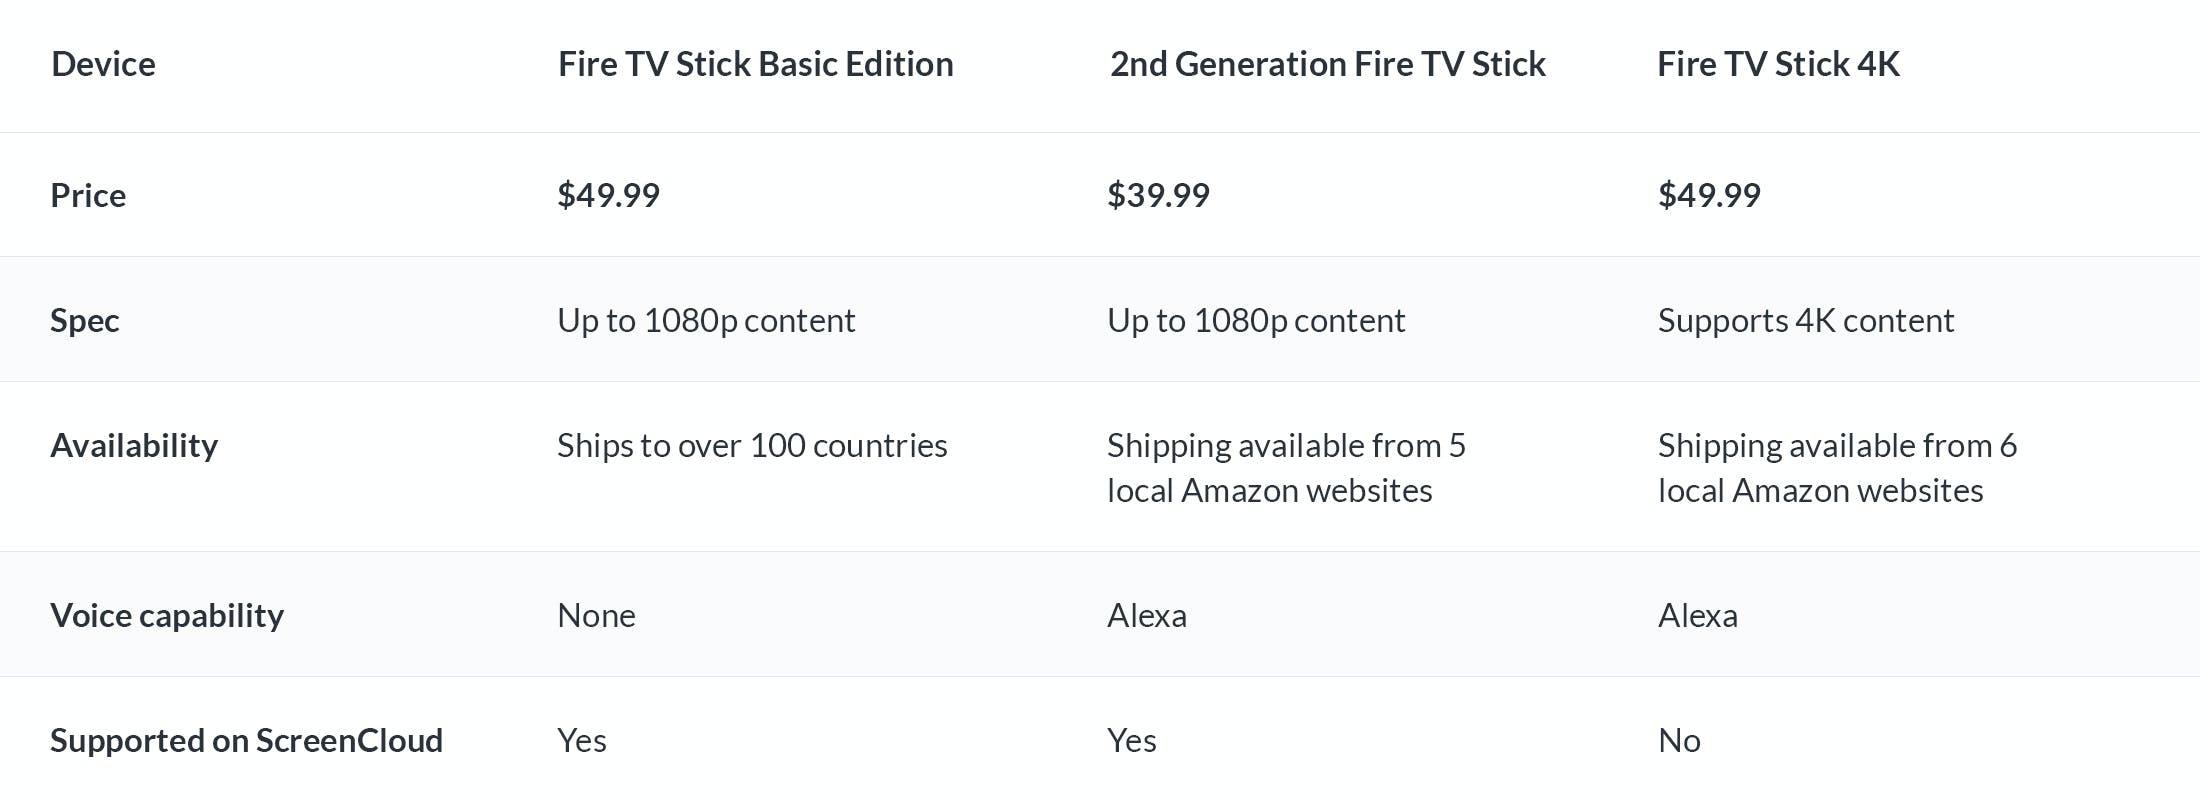 Fire TV Stick versions comparison table